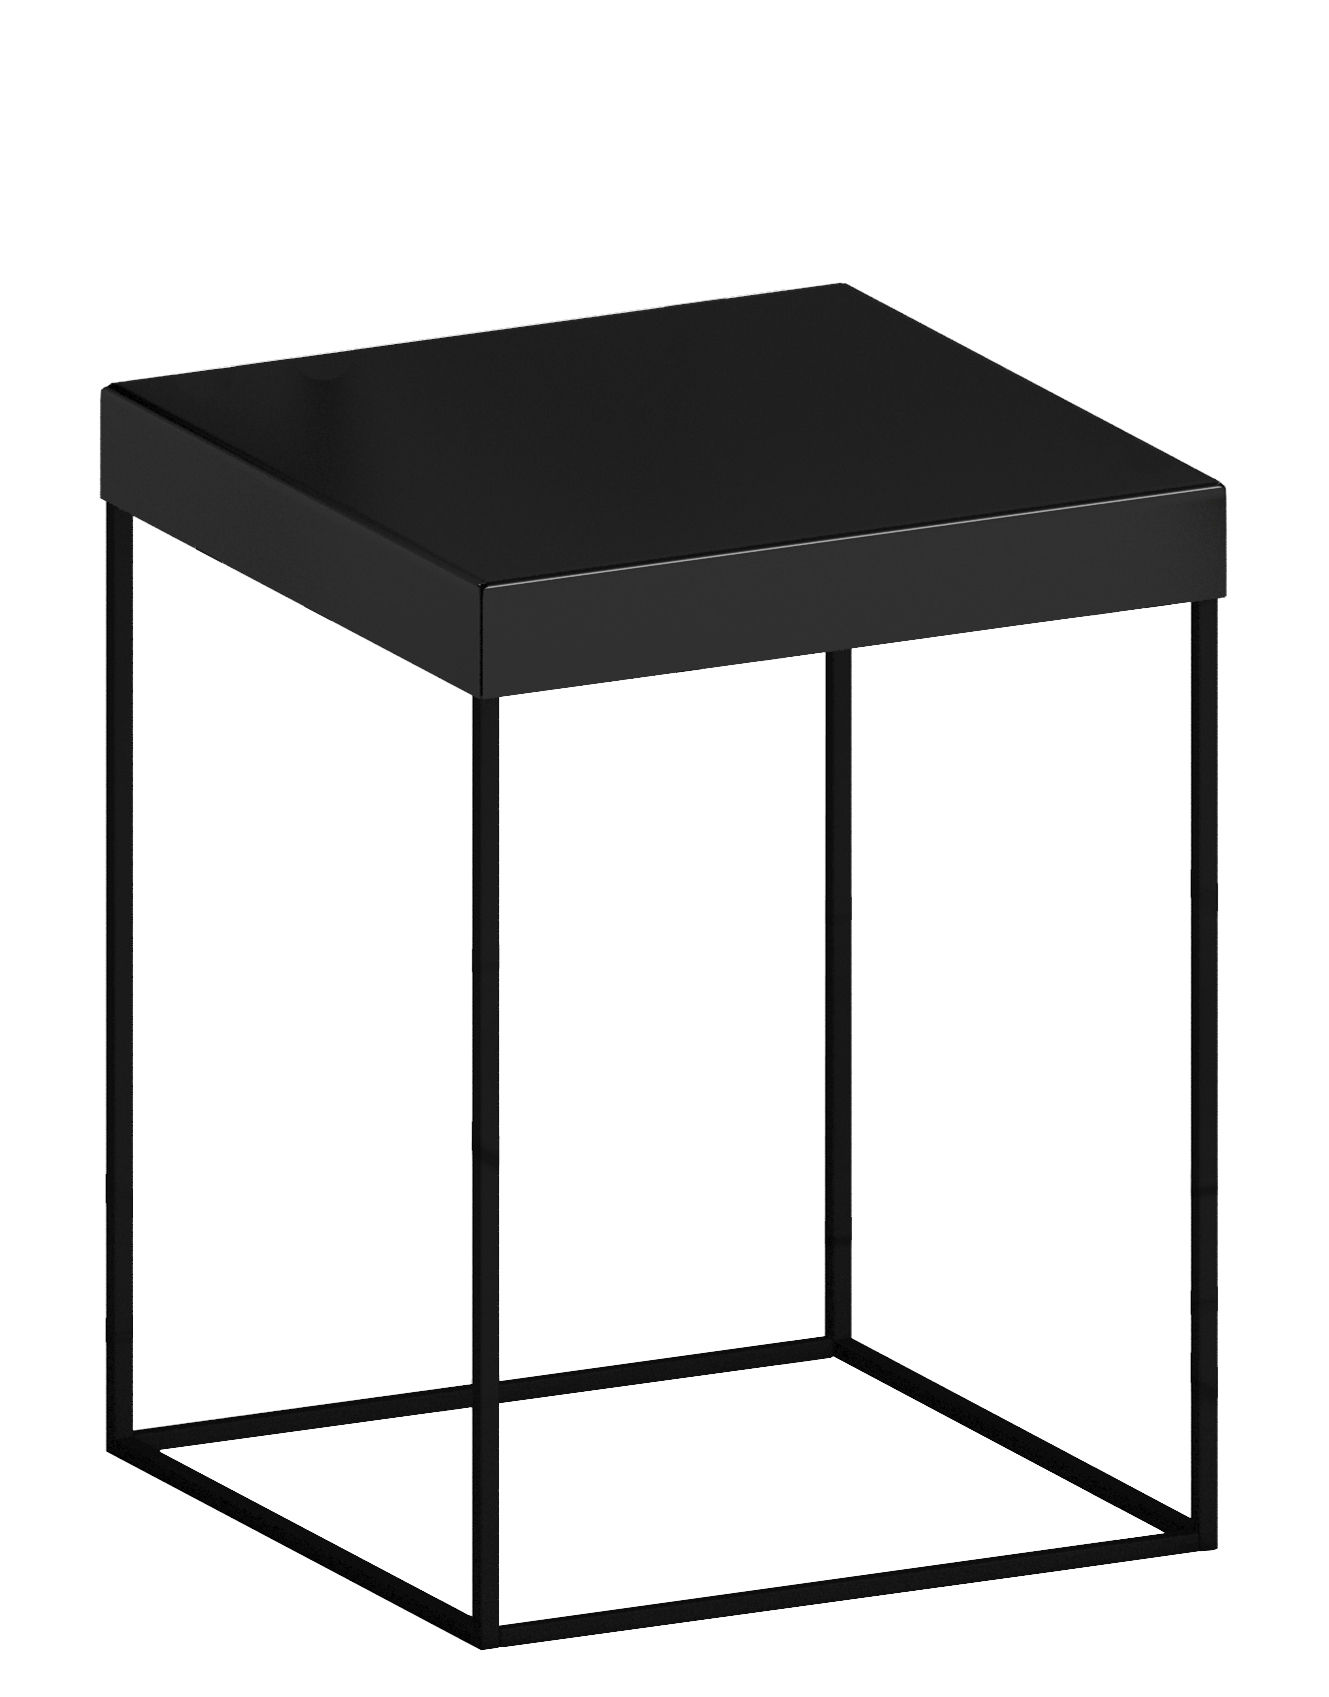 Arredamento - Tavolini  - Tavolino Slim Up - Nero ramato - Acciaio verniciato